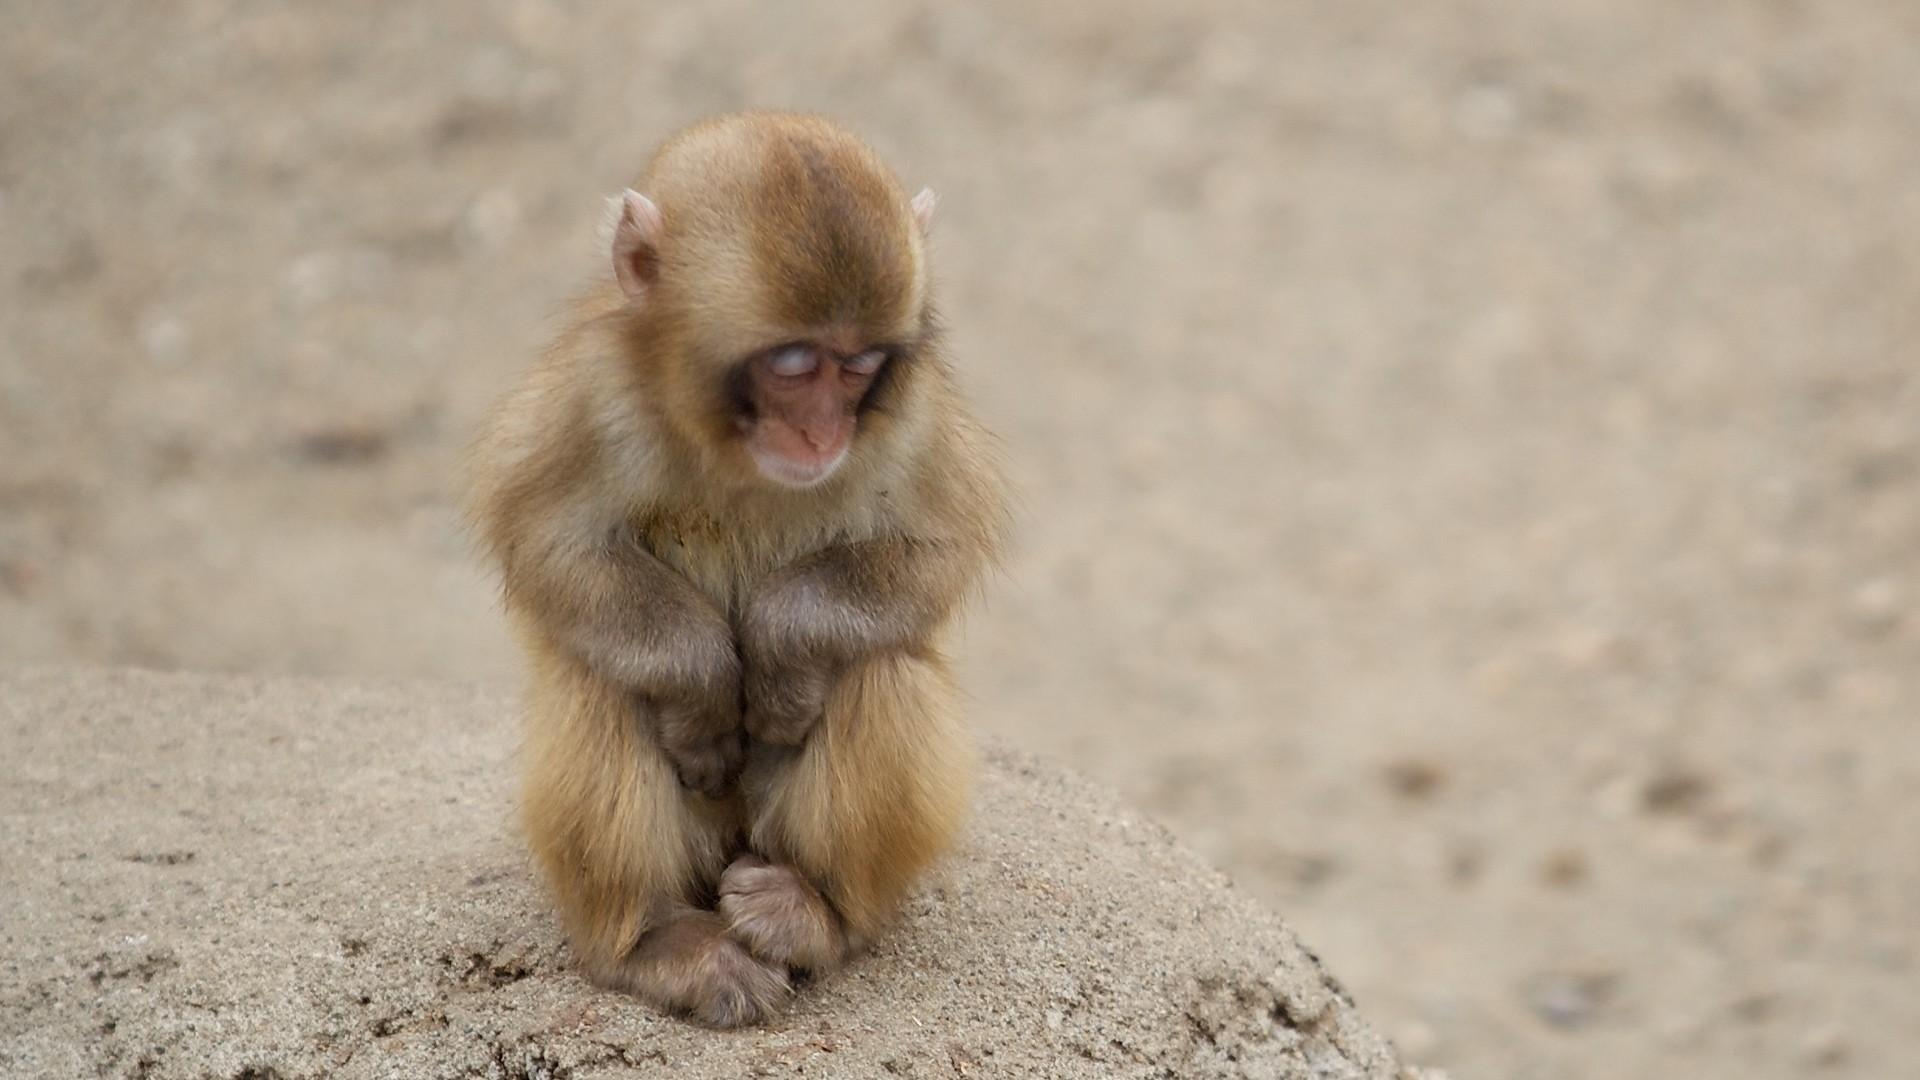 Wallpaper monkey, baby, holiday, sand